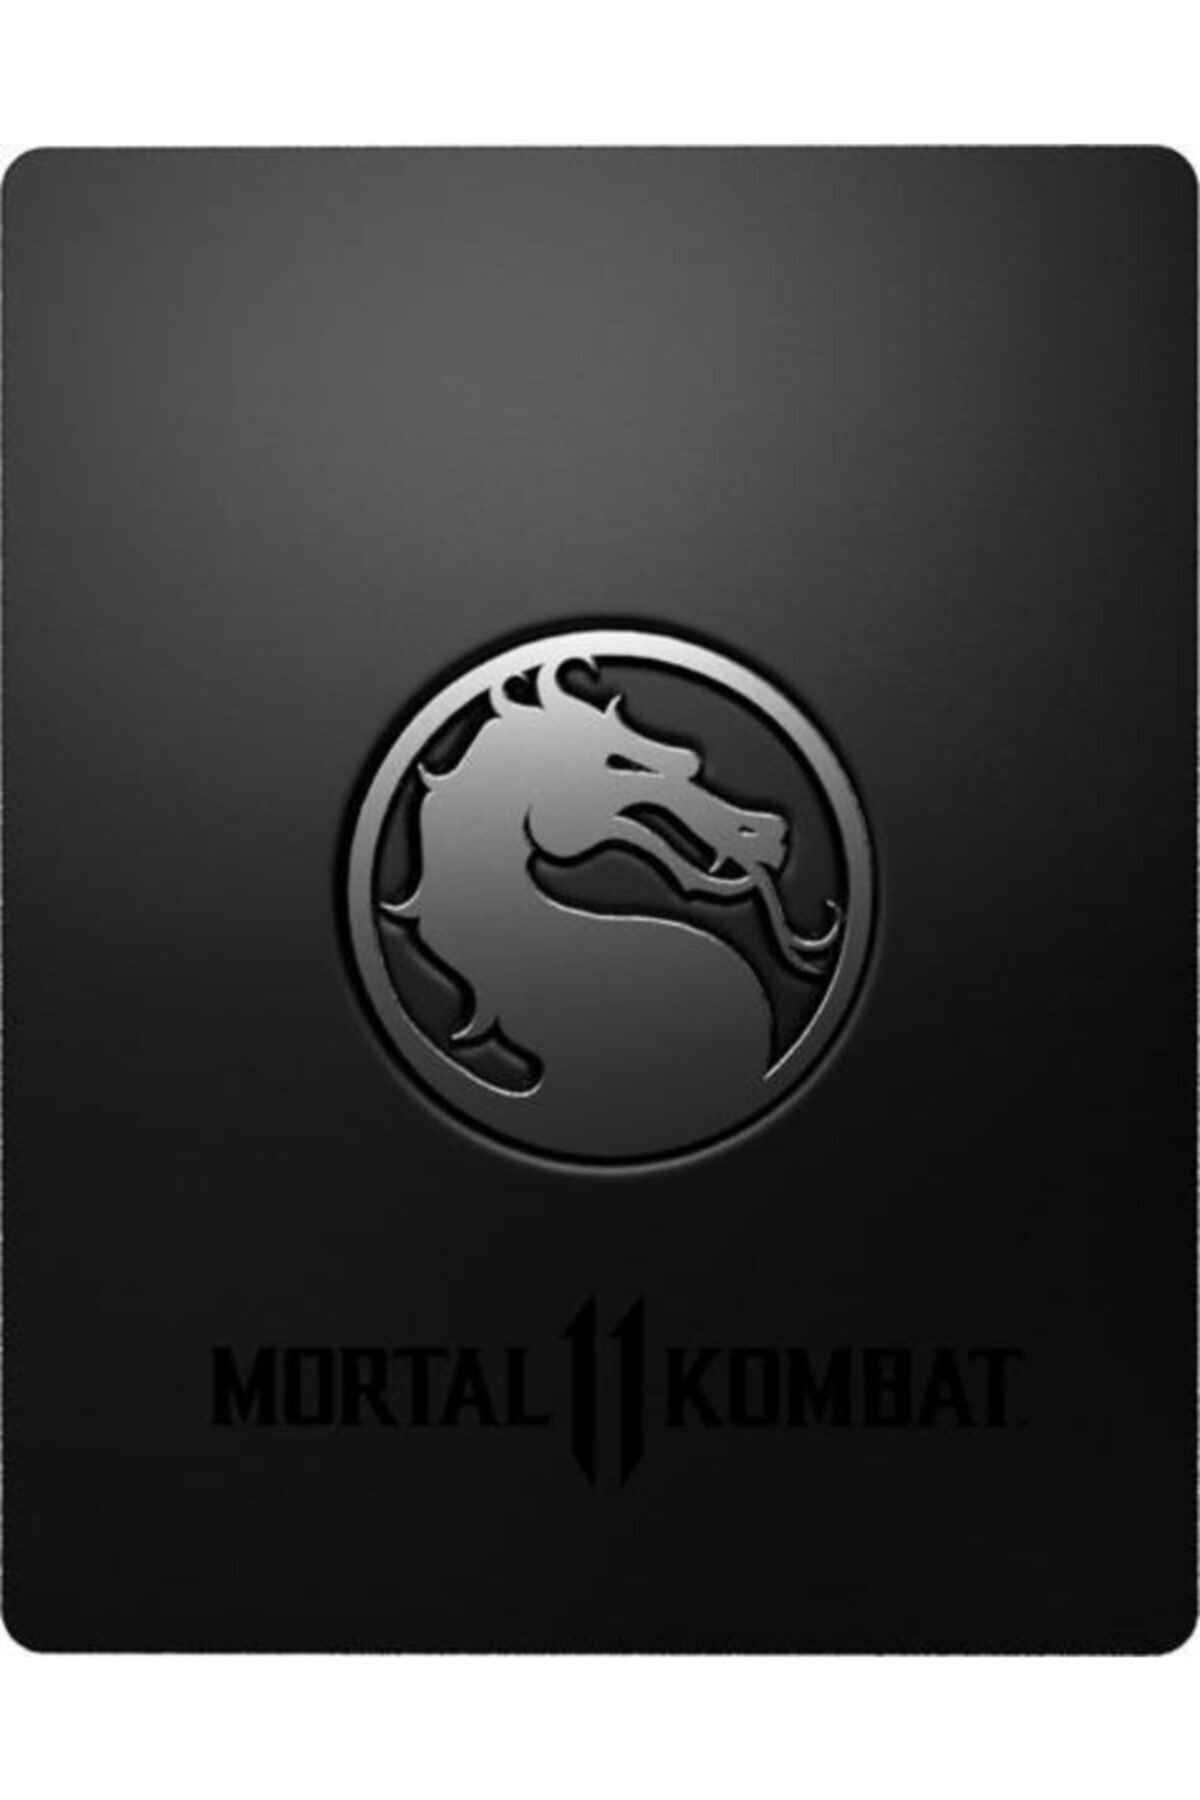 Warner Bros Mortal Kombat 11 Ultimate Limited Edition Xbox One Series X 2